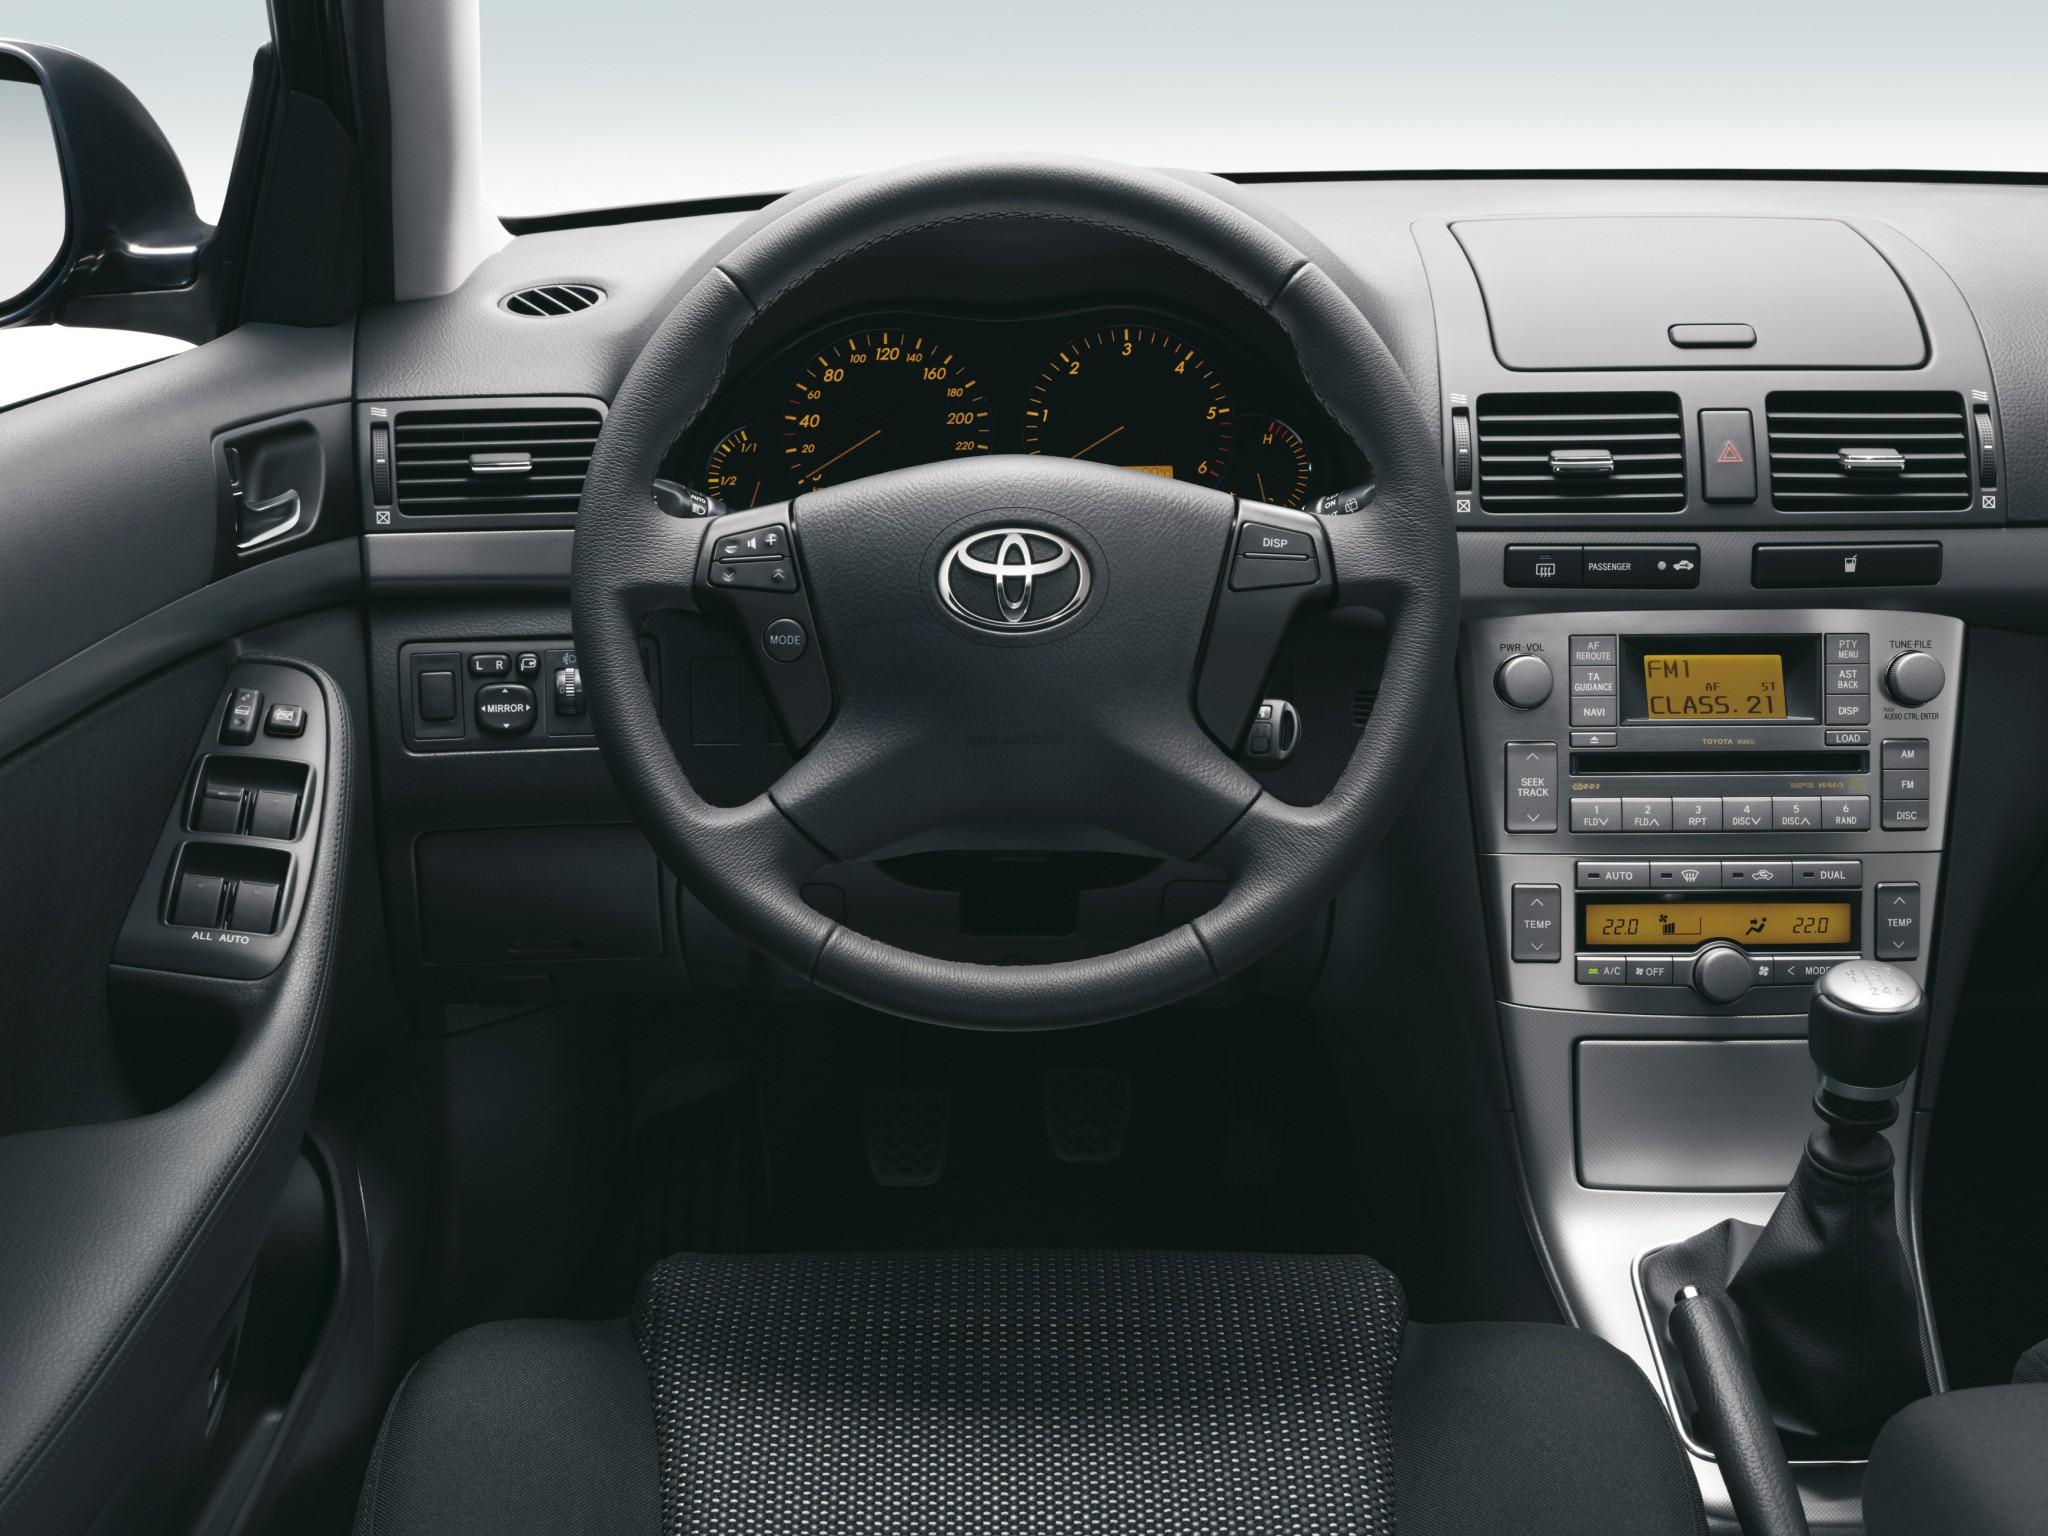 Toyota Avensis 2007 Interior